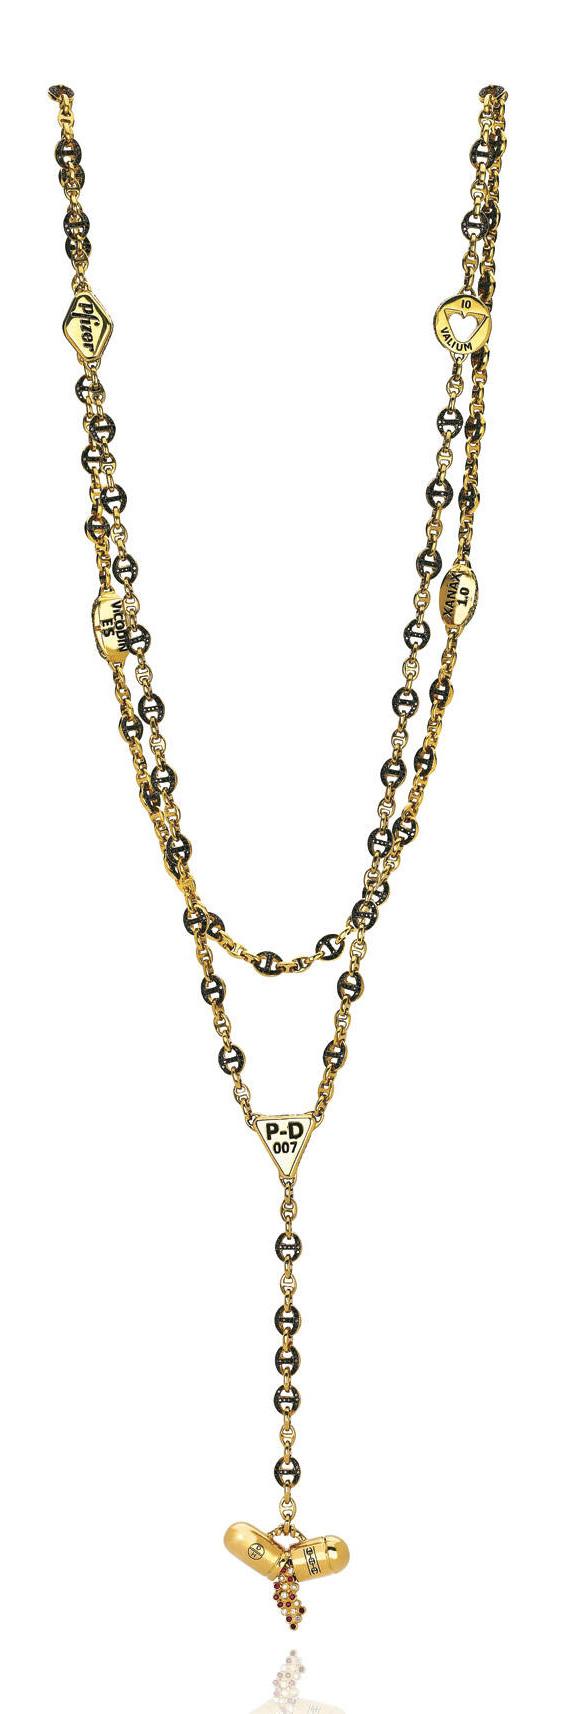 hirst_jewelry5